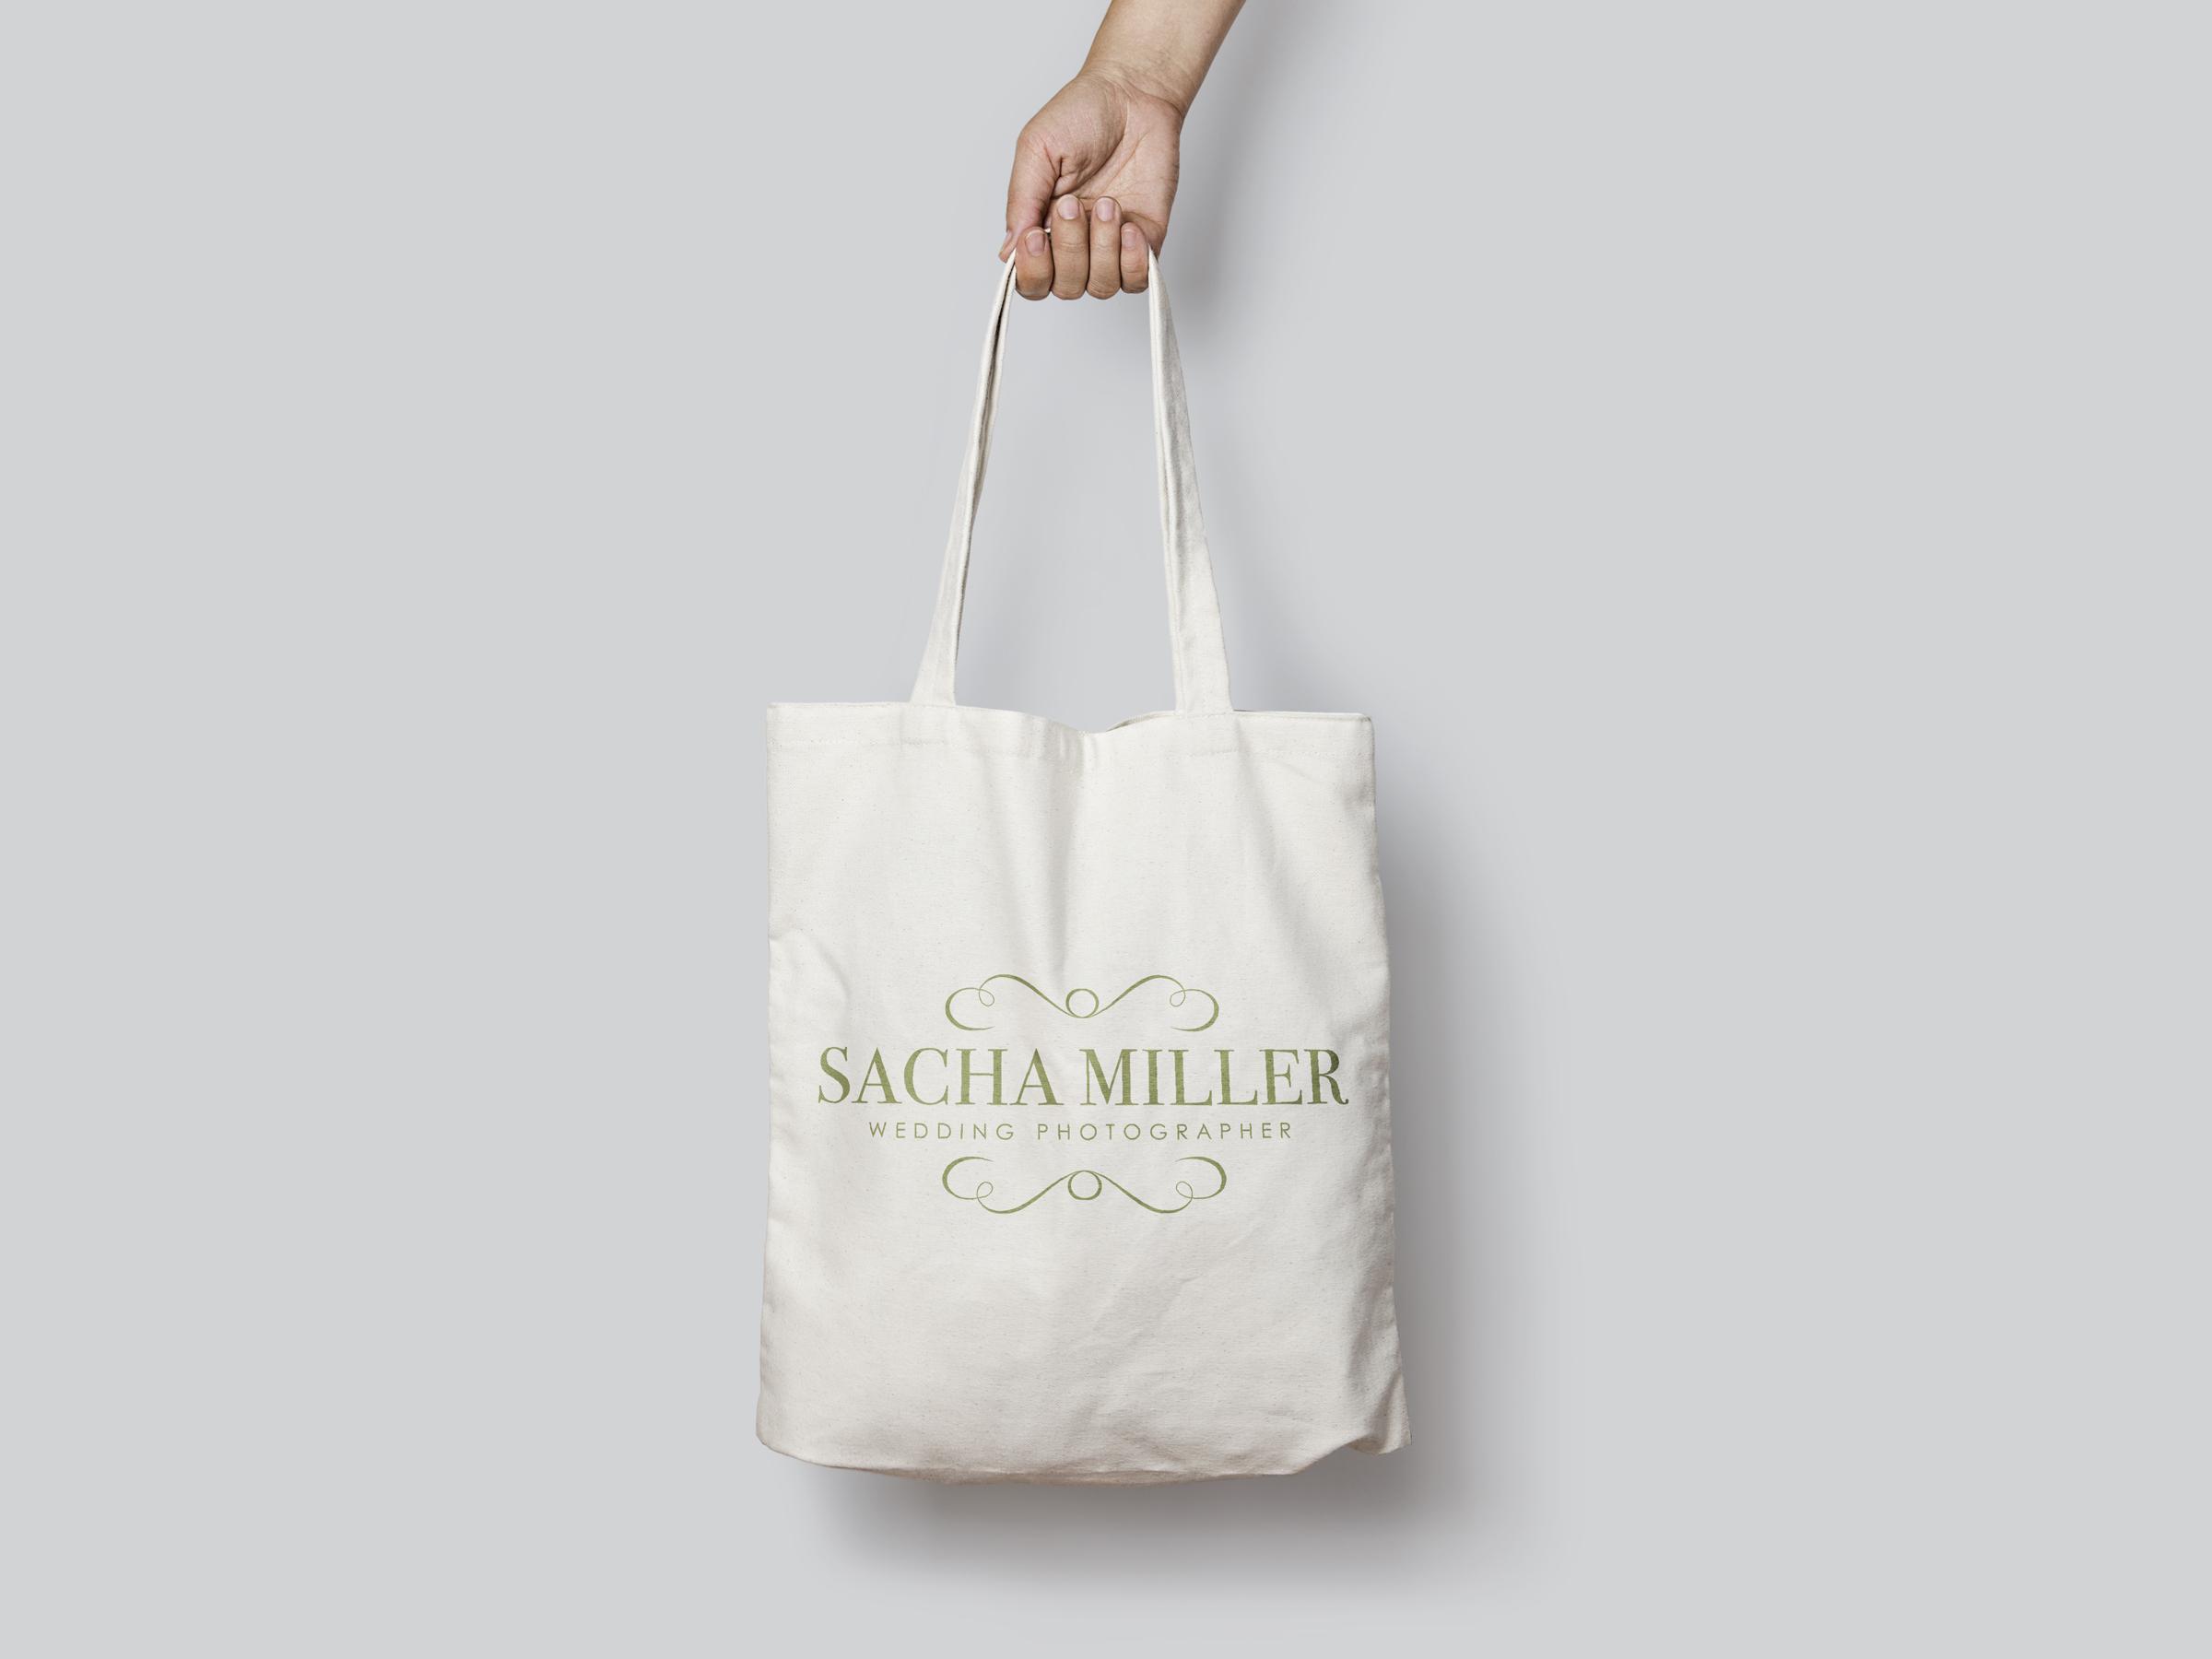 Sacha-Miller_totebag.JPG